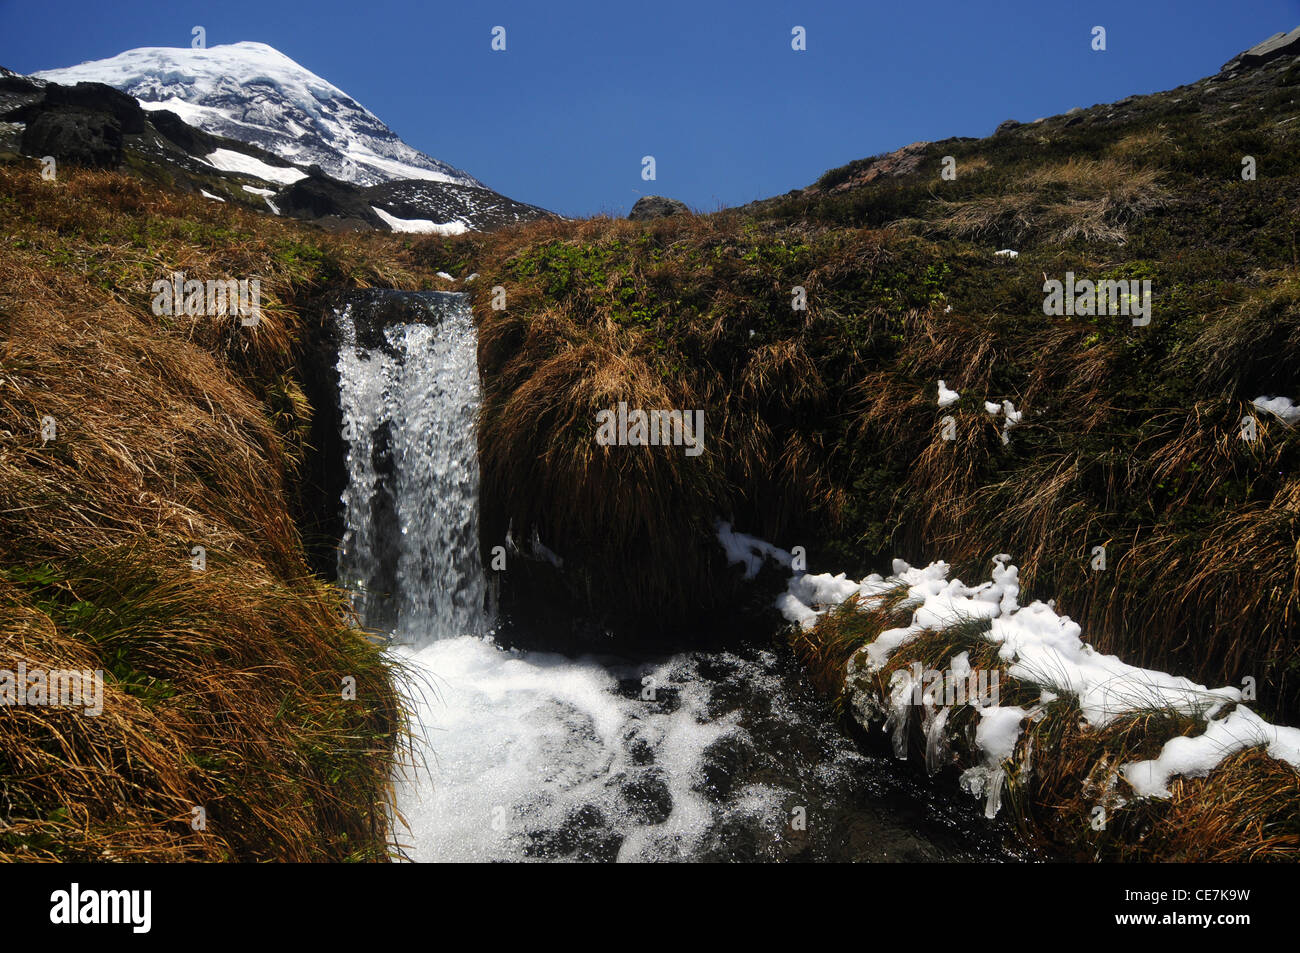 snowmelt-streams-running-down-slopes-of-